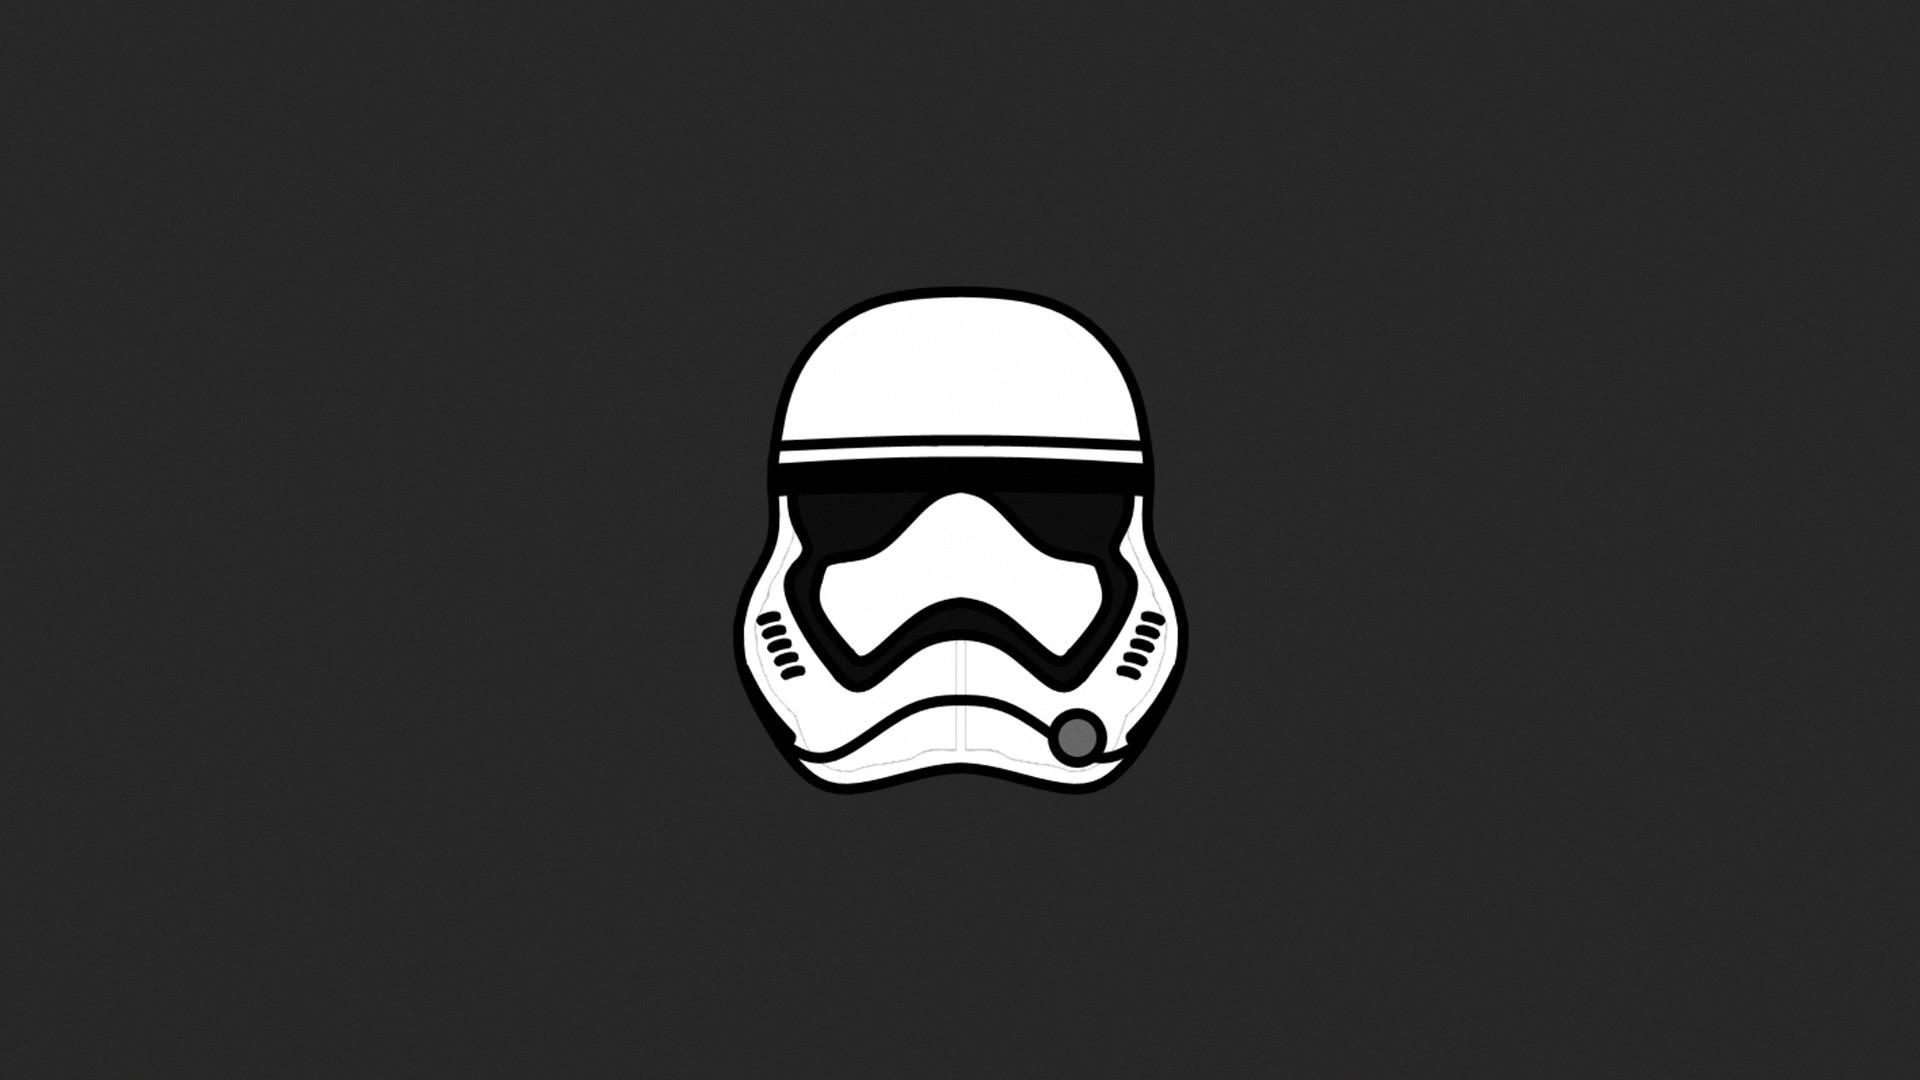 … star wars battlefront stormtrooper hd desktop wallpaper; what s your  wallpaper page 63 off topic linus tech tips …